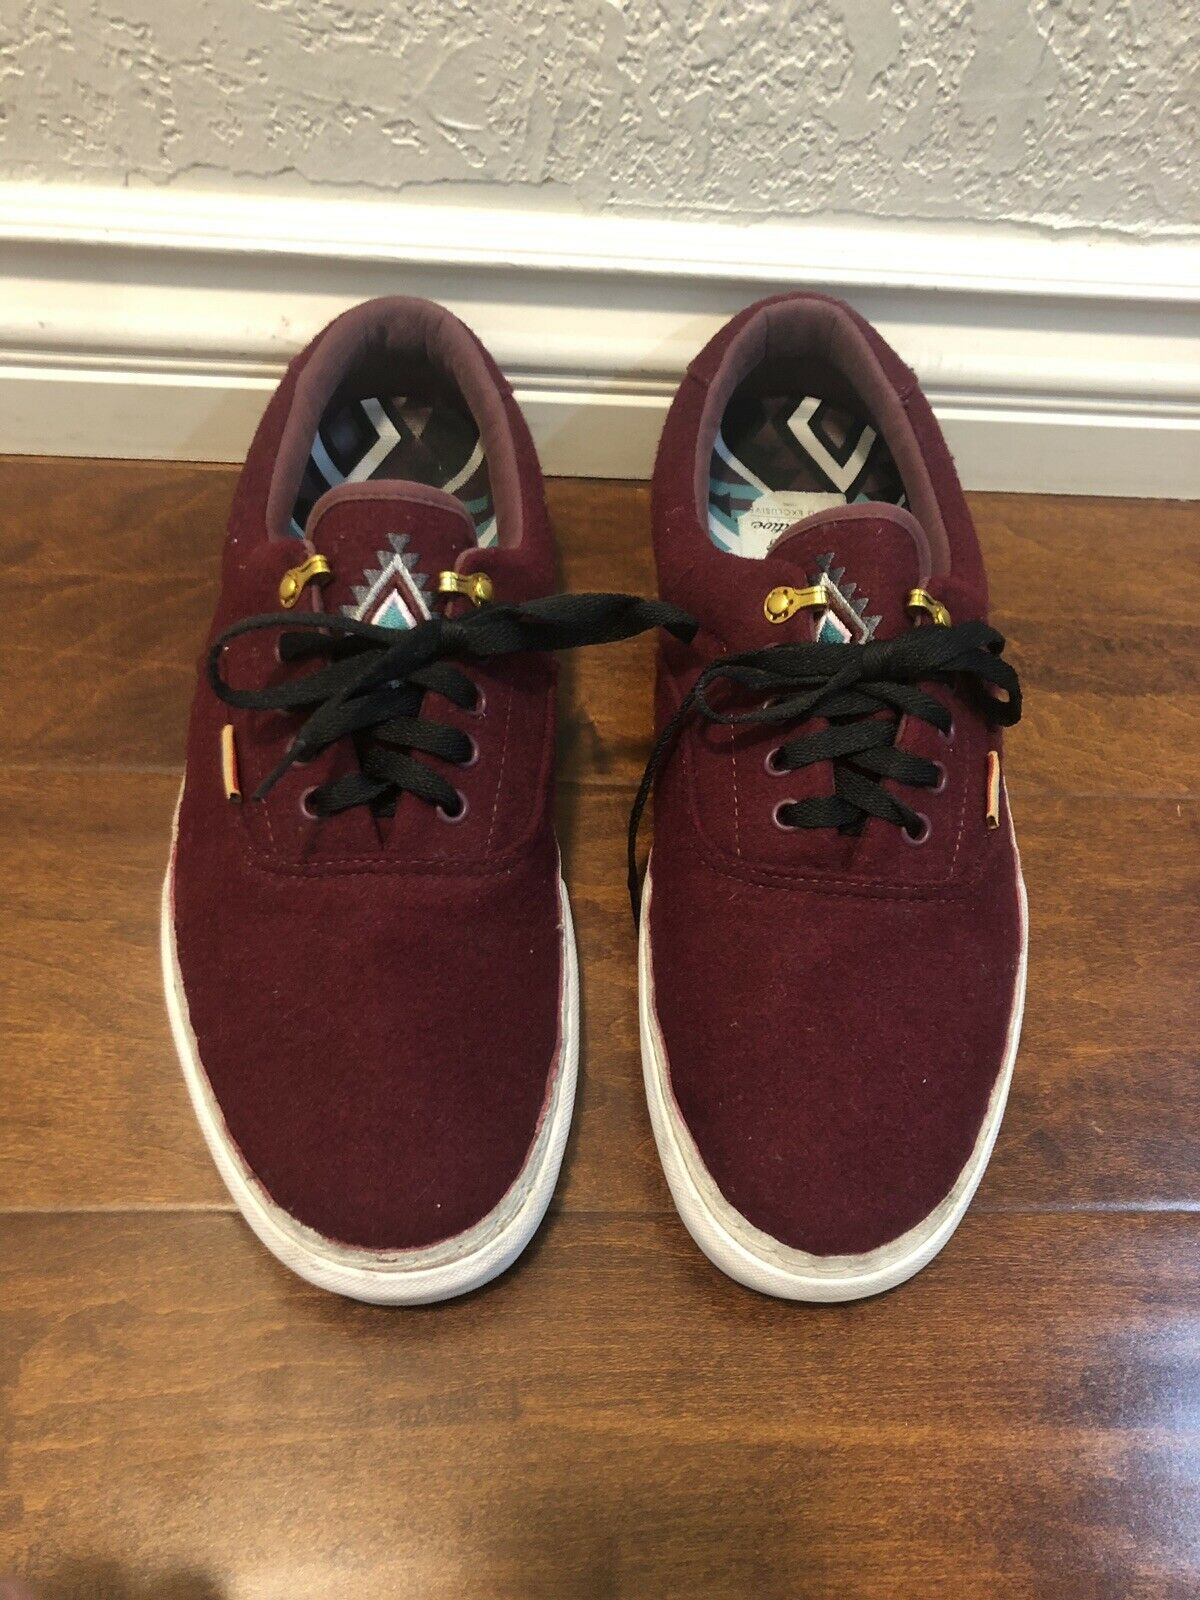 Limited Vans shoes Era 46 Burgundy Red Primitive Pro Native American Sz 13 US